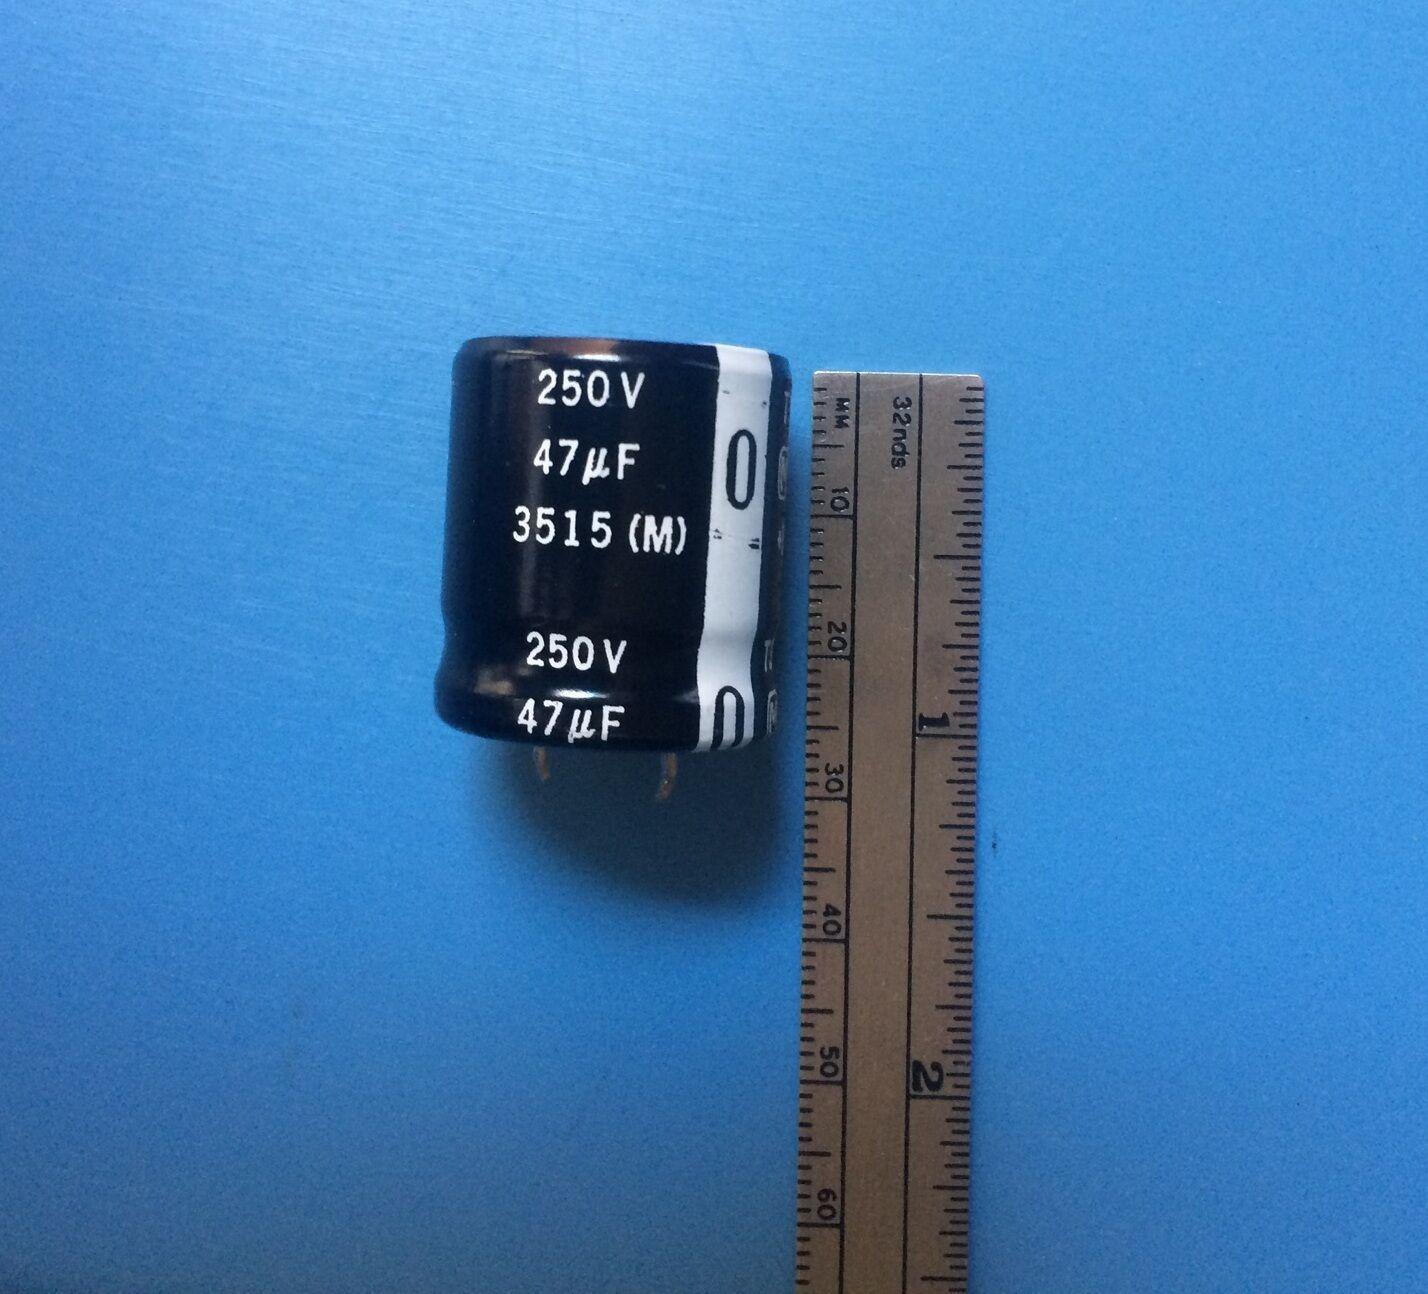 ECE-C2EG470D9 PANASONIC CAPACITOR 47UF 250V 20X25mm SNAP IN TSNH 105/'